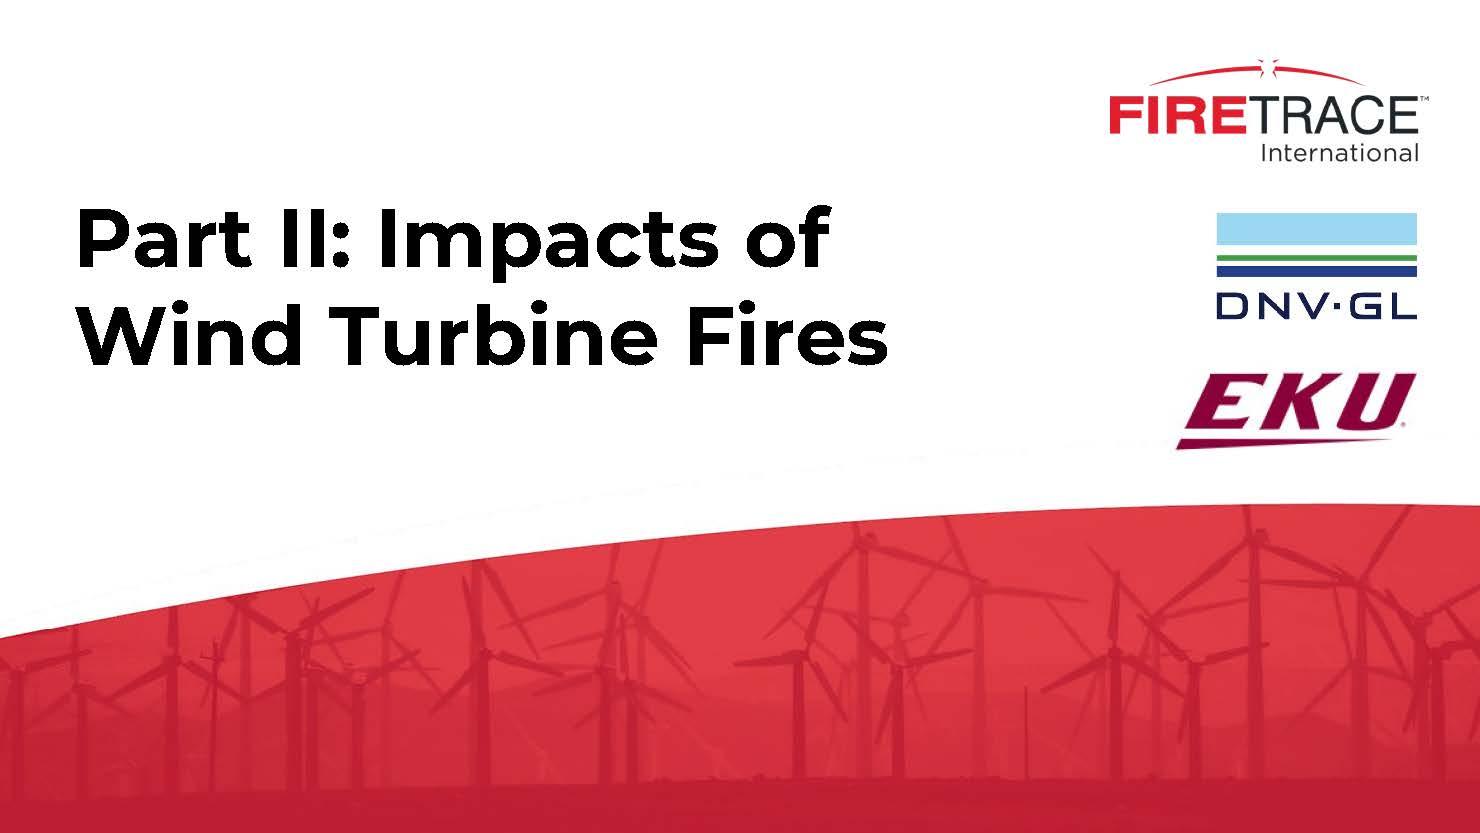 Part II - Impacts of Wind Turbine Fires